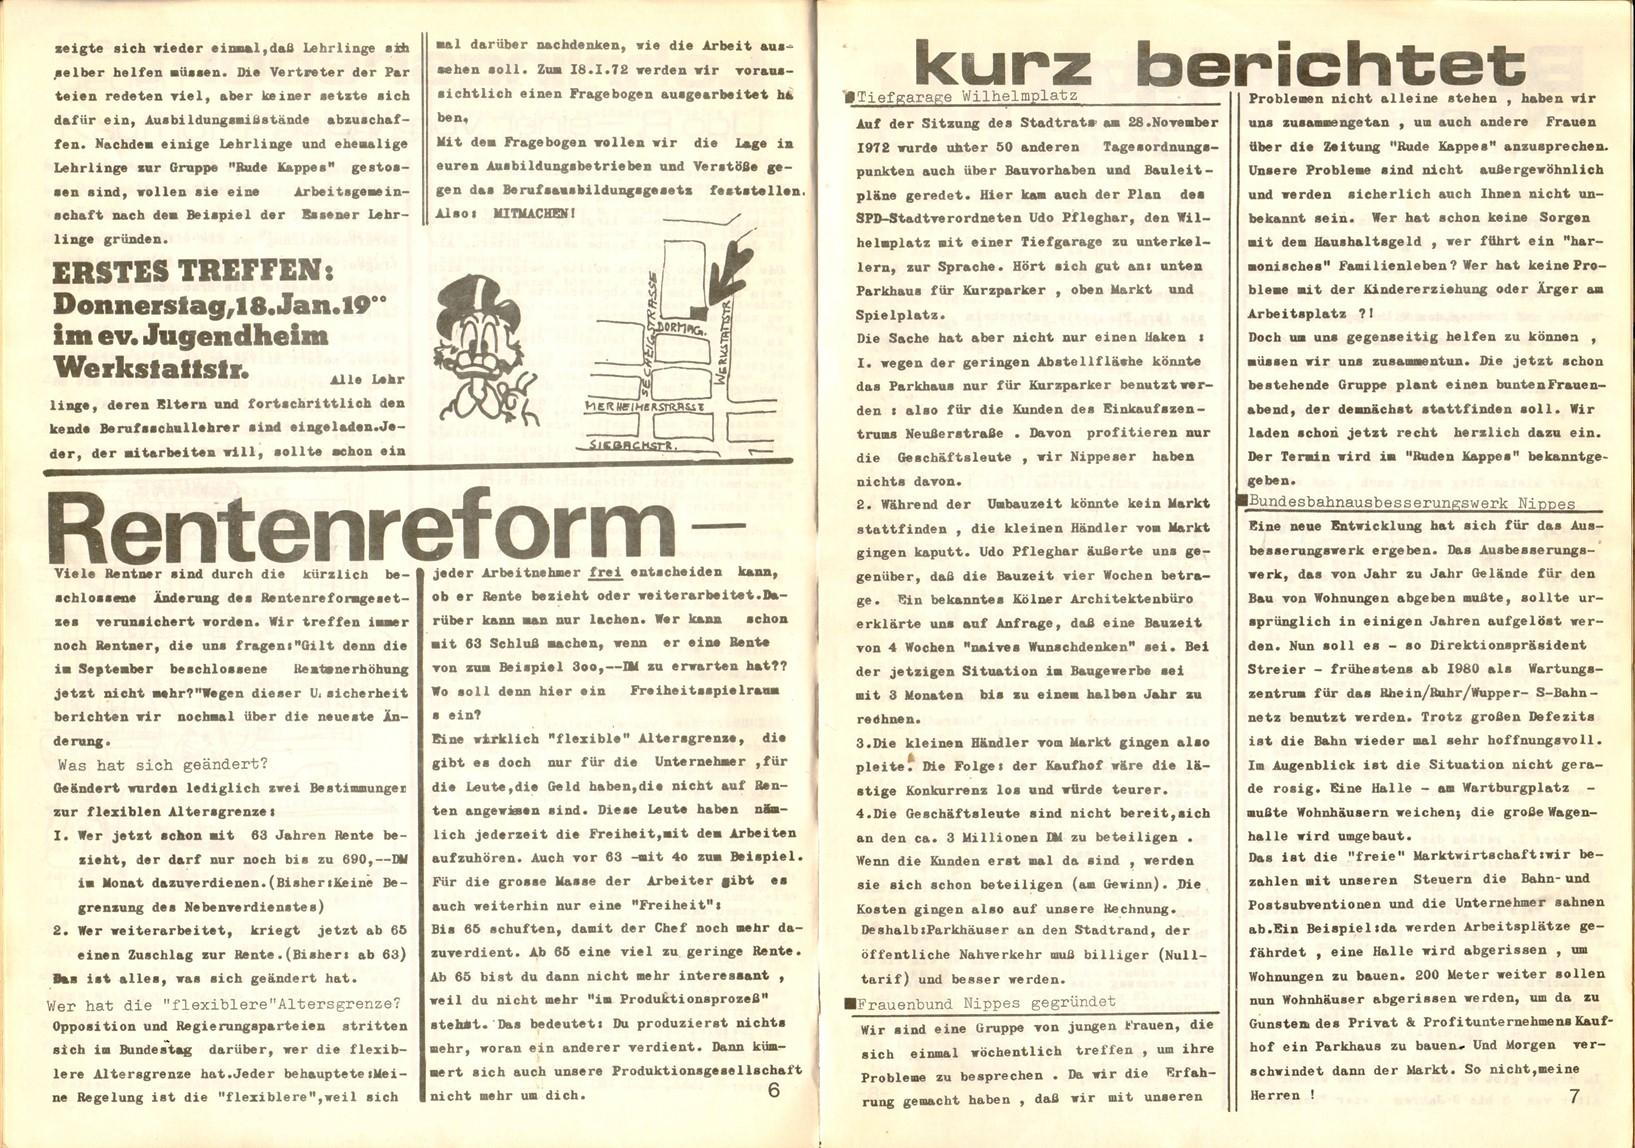 Koeln_Rude_Kappes_1973_01_04